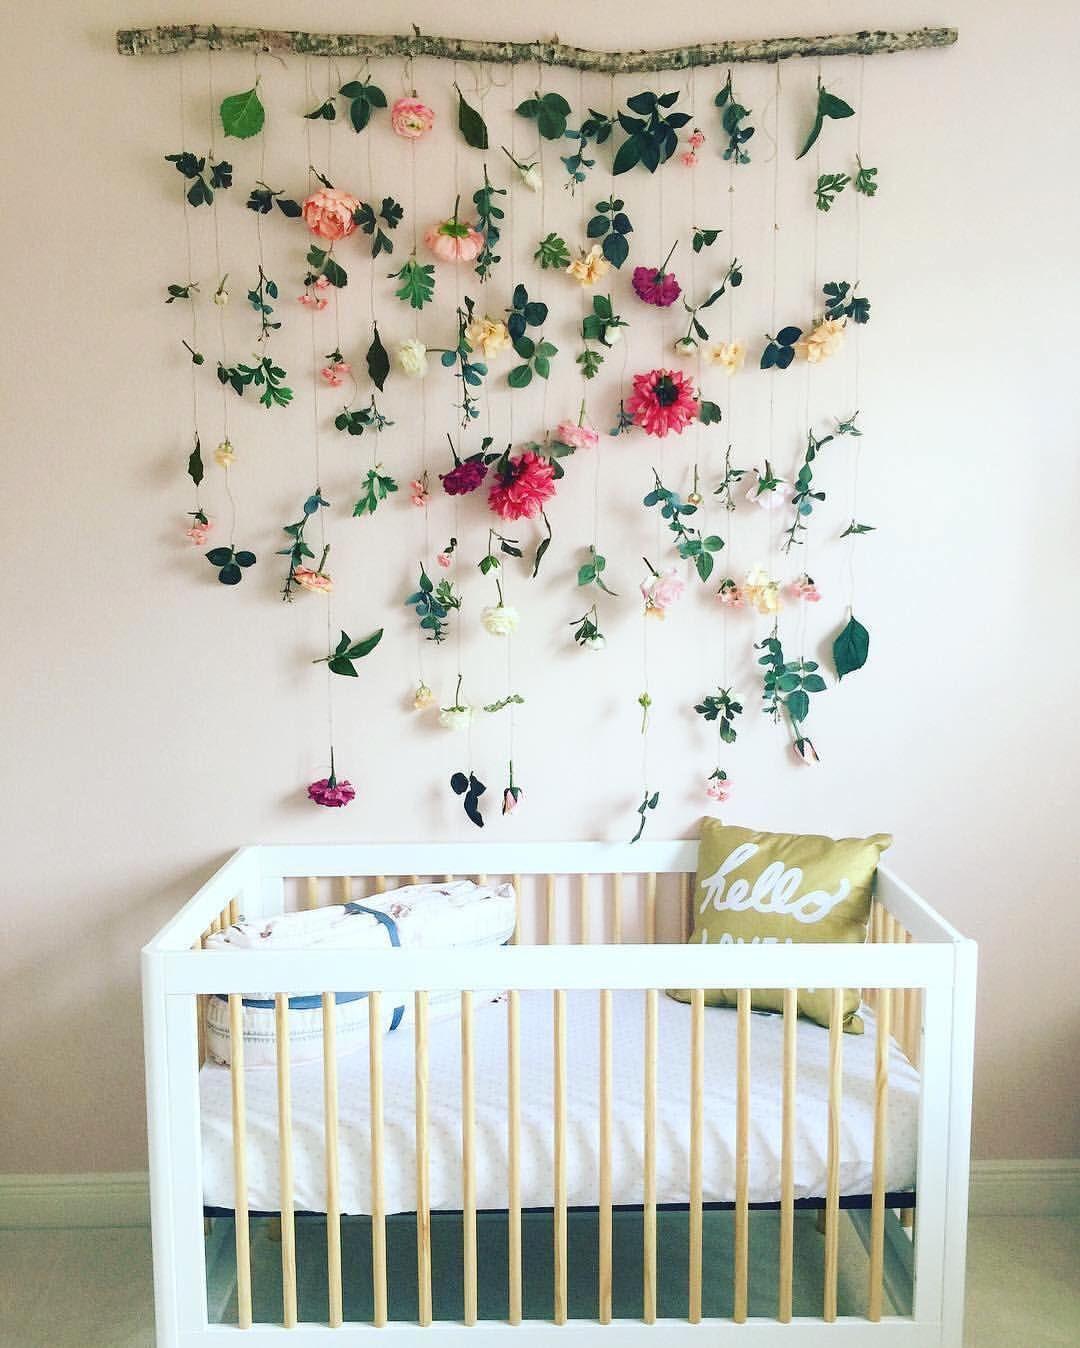 22 Baby Room Designs And Beautiful Nursery Decorating Ideas: Modern Nursery. Floral Nursery. DIY. Handmade. Colorful